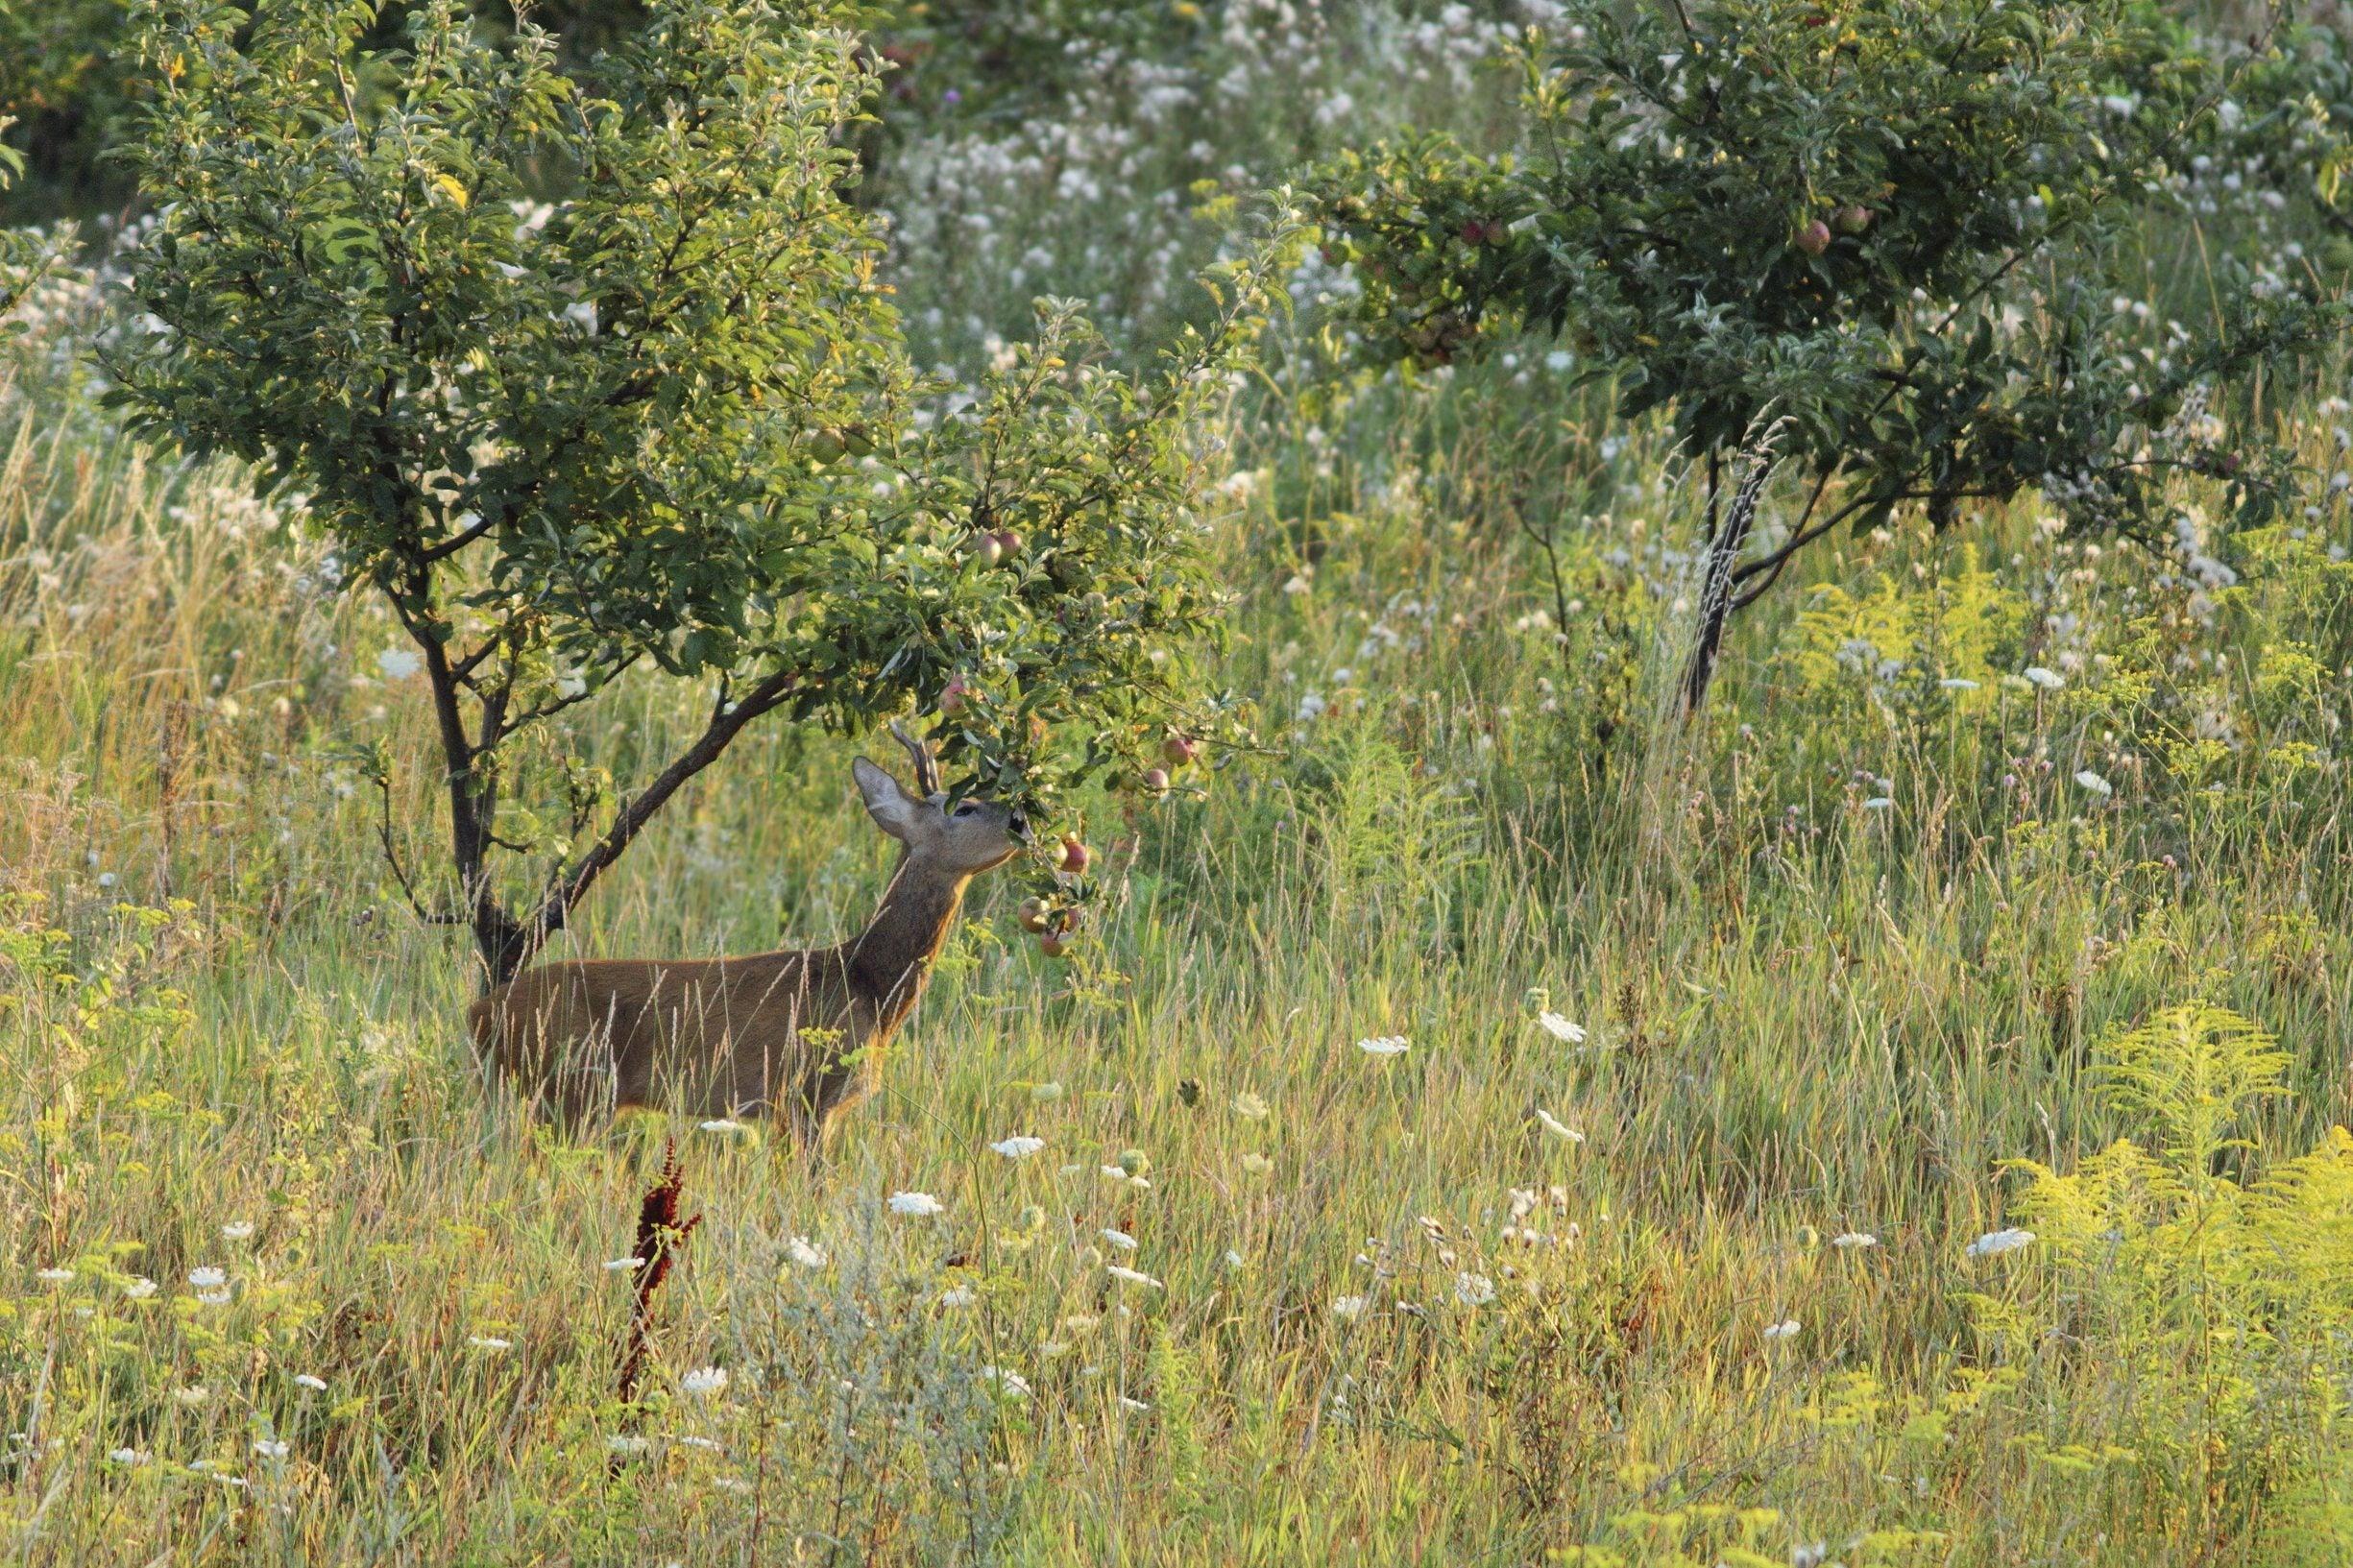 Planting under pecan trees : Deer proofing fruit trees tips on keeping away from